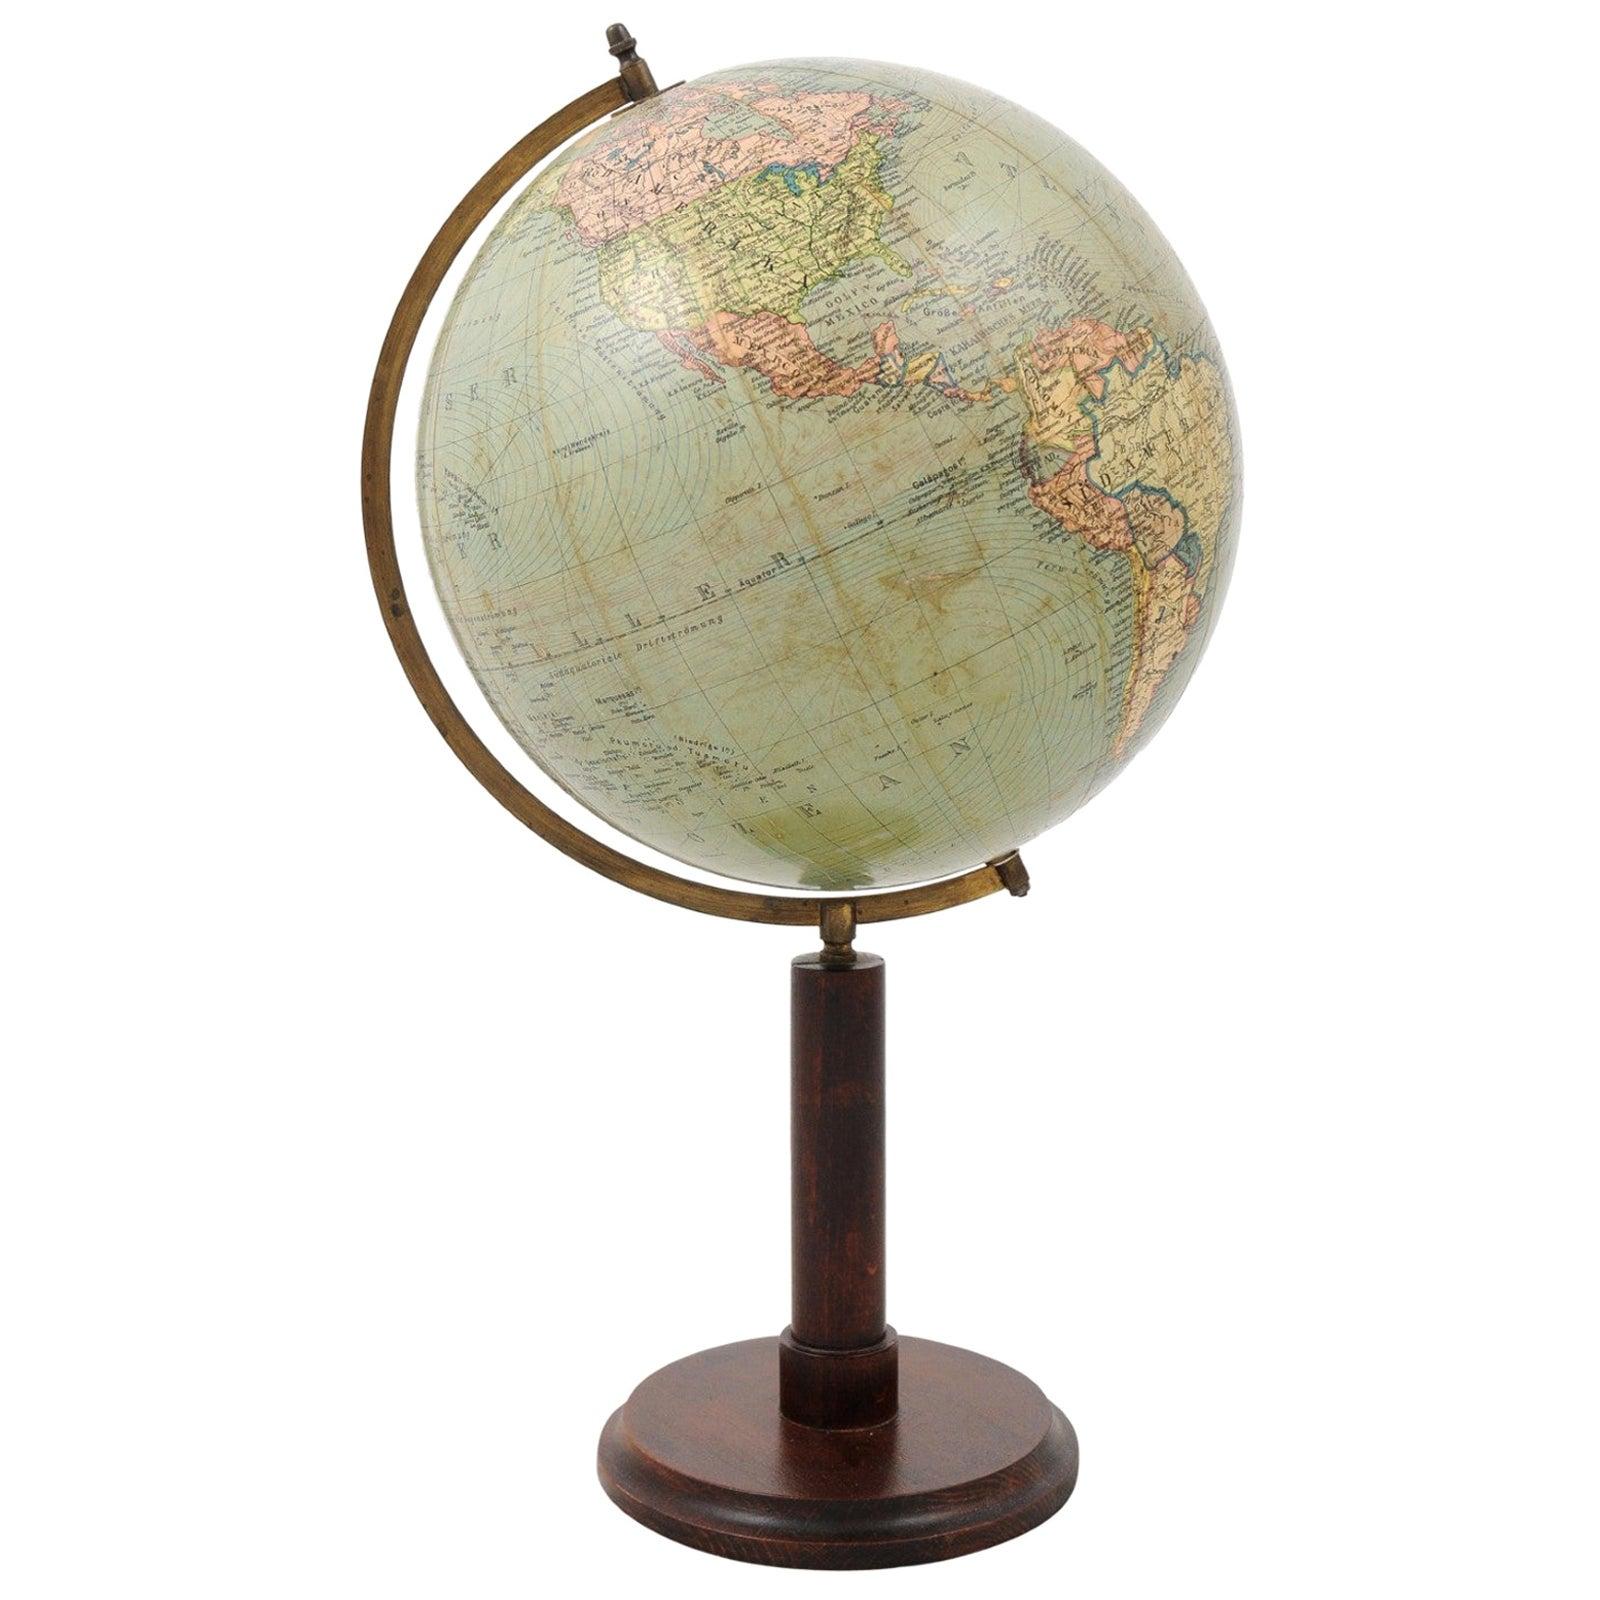 German 1890s Columbus Volksglobus Terrestrial Globe with Circular Wooden Base